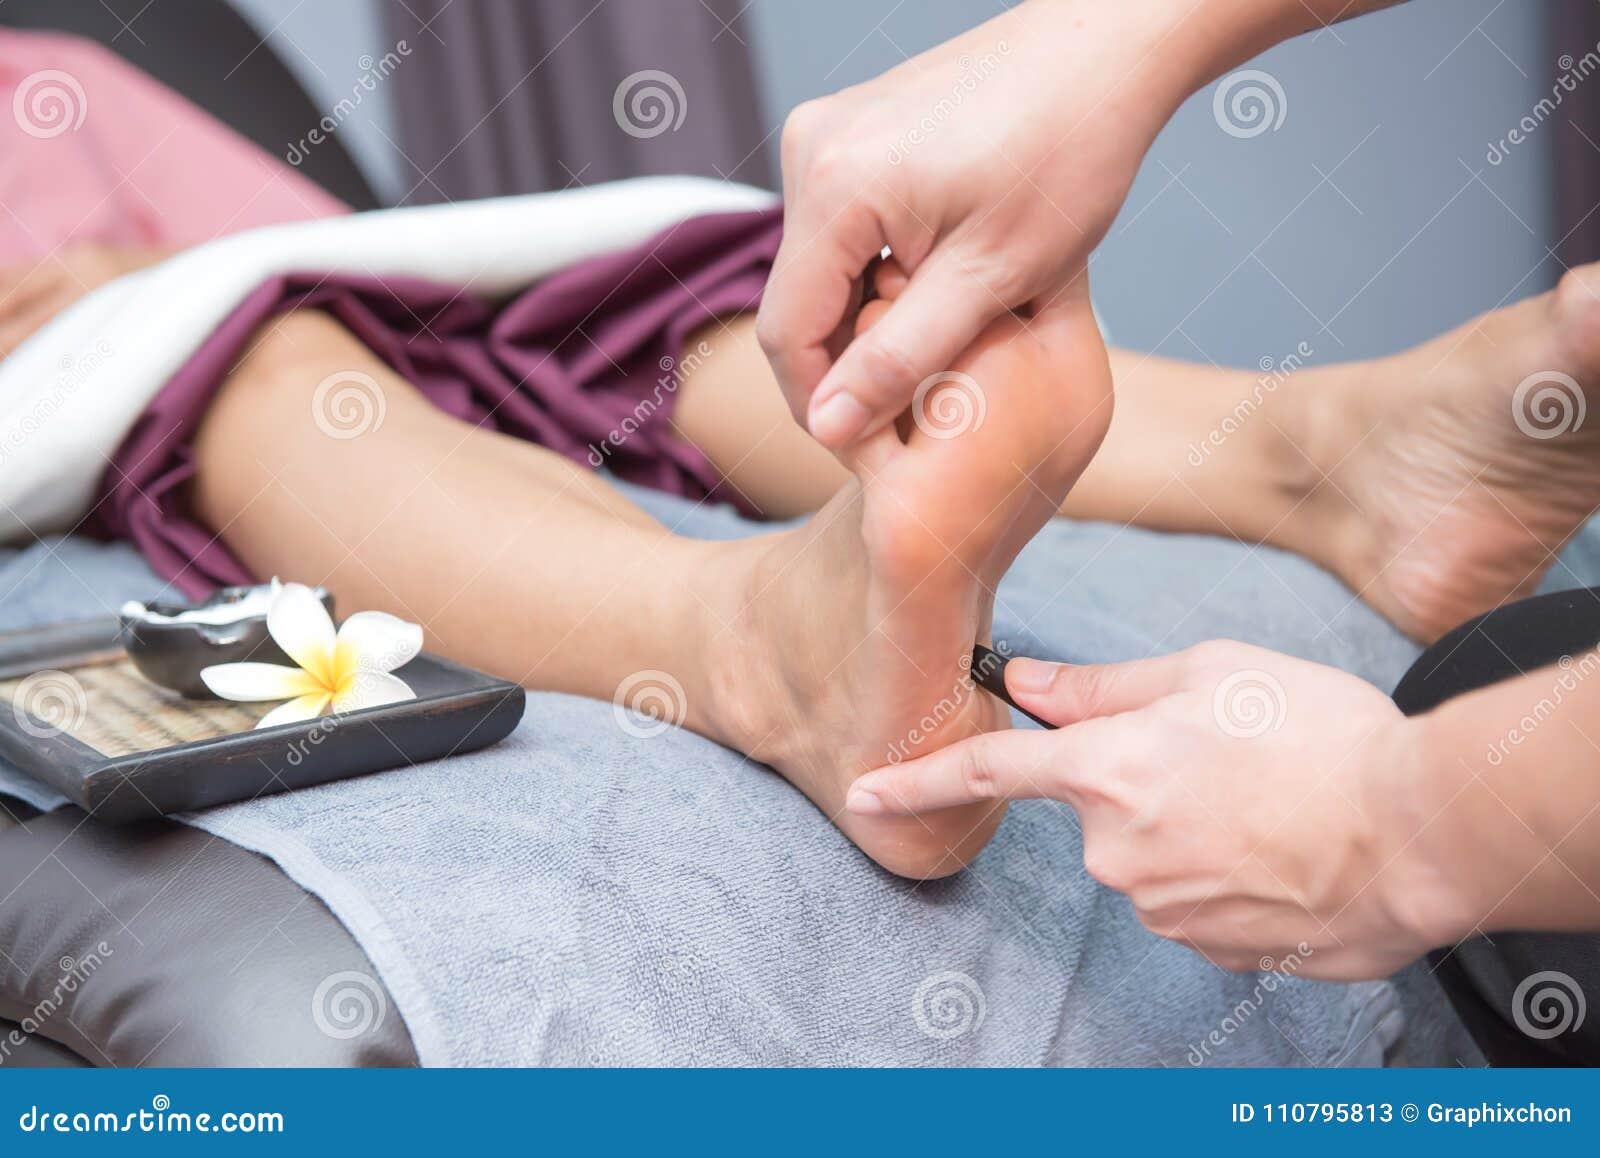 The Key Benefits Of Aquatic Bodywork spa-thai-foot-massage-beautiful-women-relaxing-healthy-aromatherapy-spa-thai-foot-massage-110795813